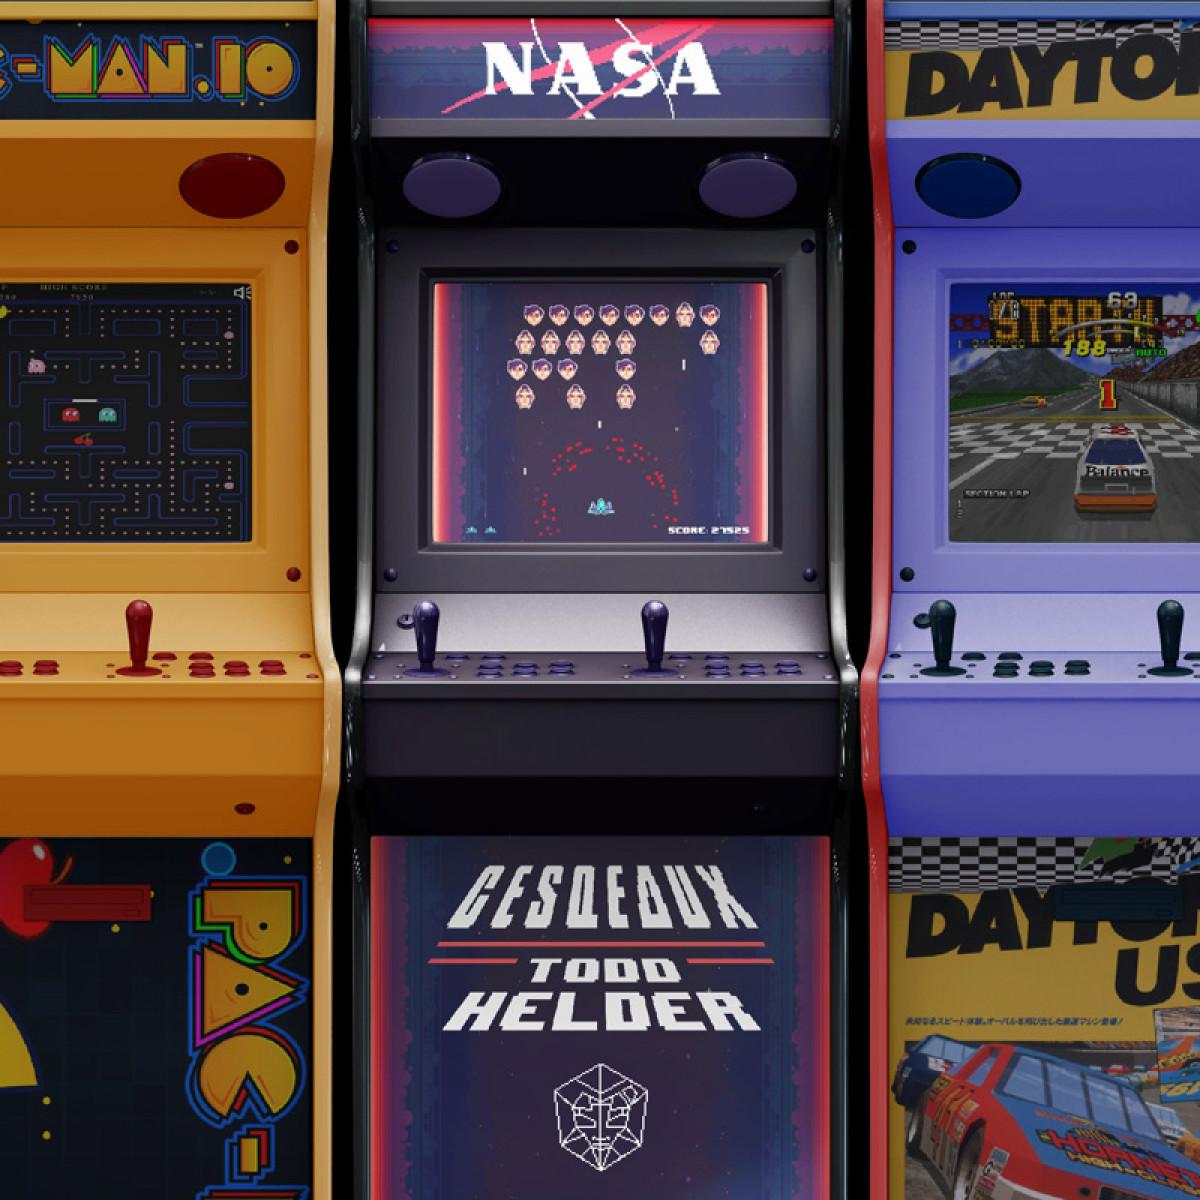 Cover Cesqeaux & Todd Helder - NASA